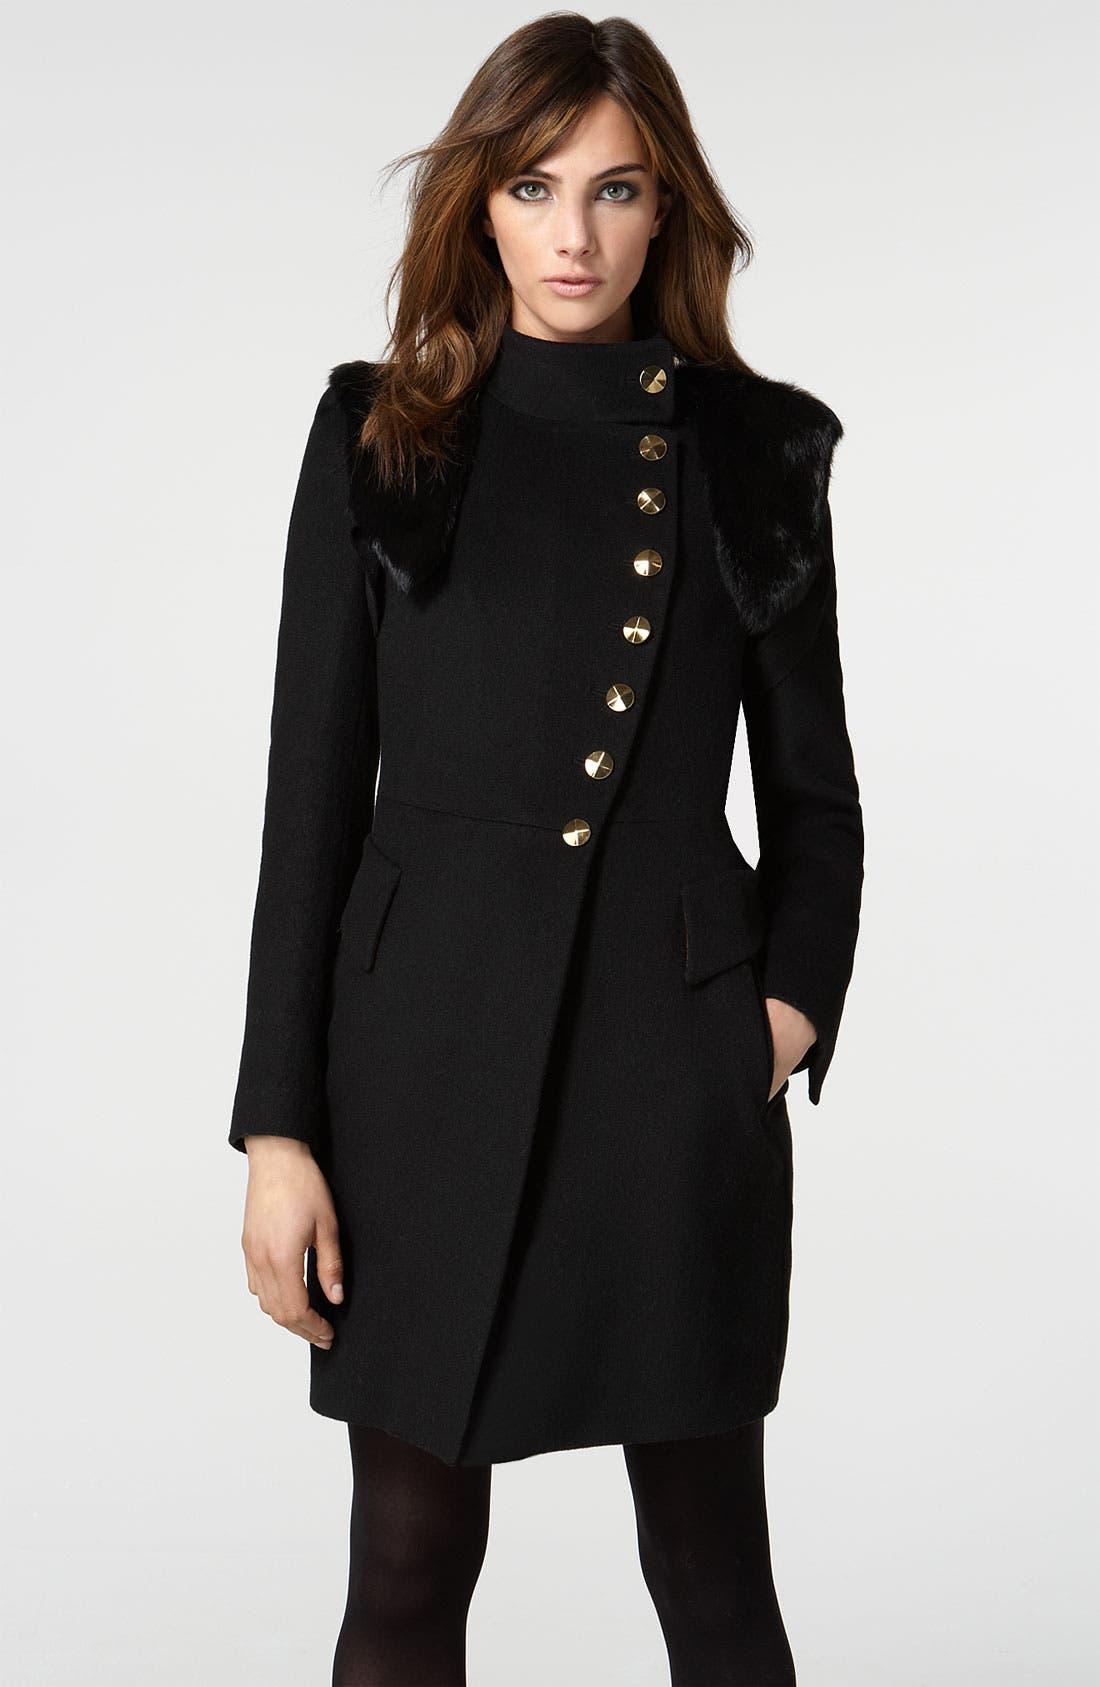 'Nicola' Coat with Removable Genuine Rabbit Fur Vest,                         Main,                         color,  Black